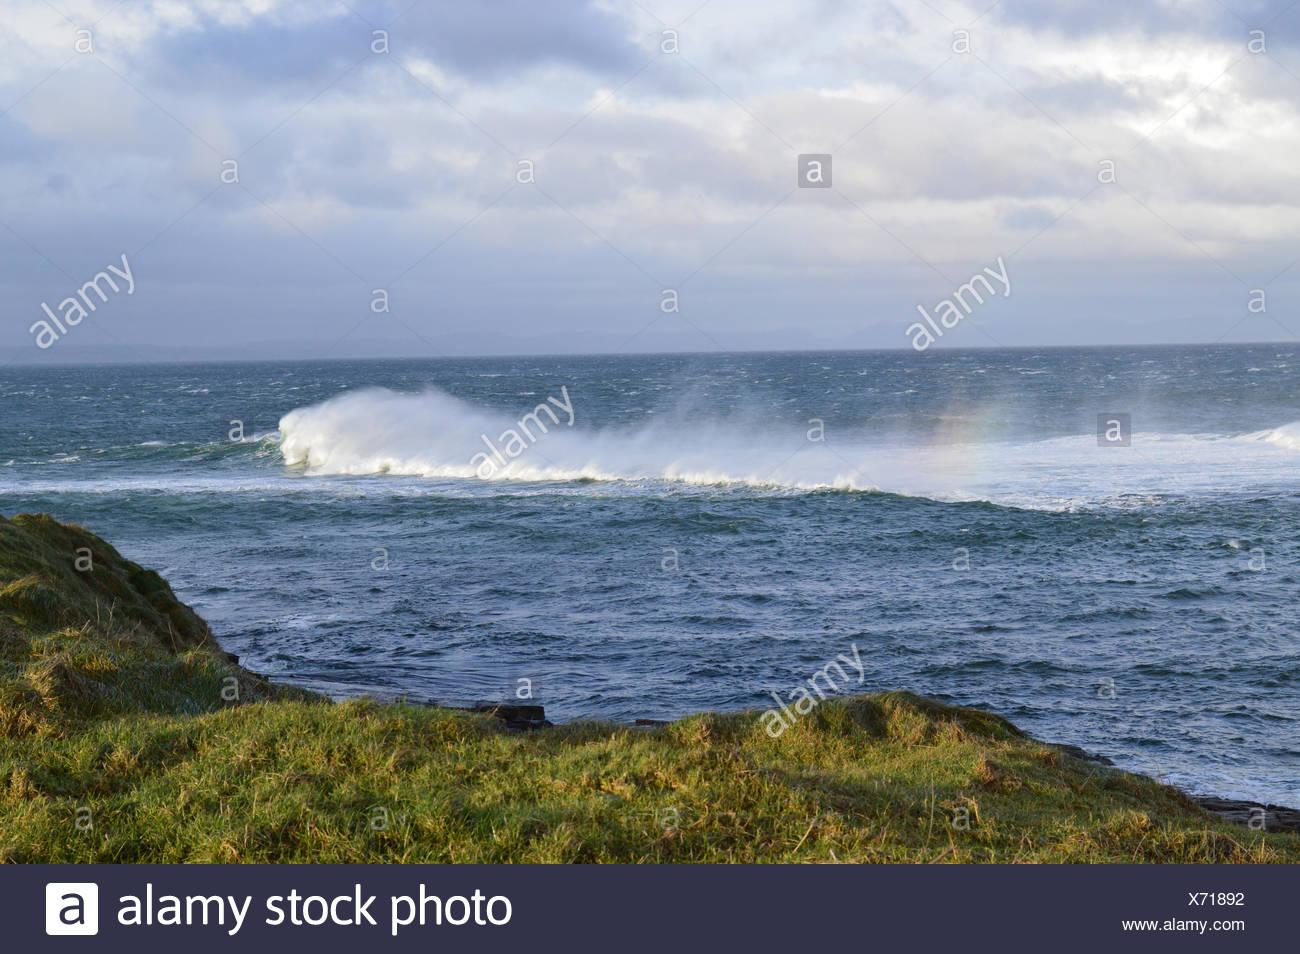 Ireland, Connacht, County Sligo, Mullaghmore, Waves breaking on Atlantic coast - Stock Image